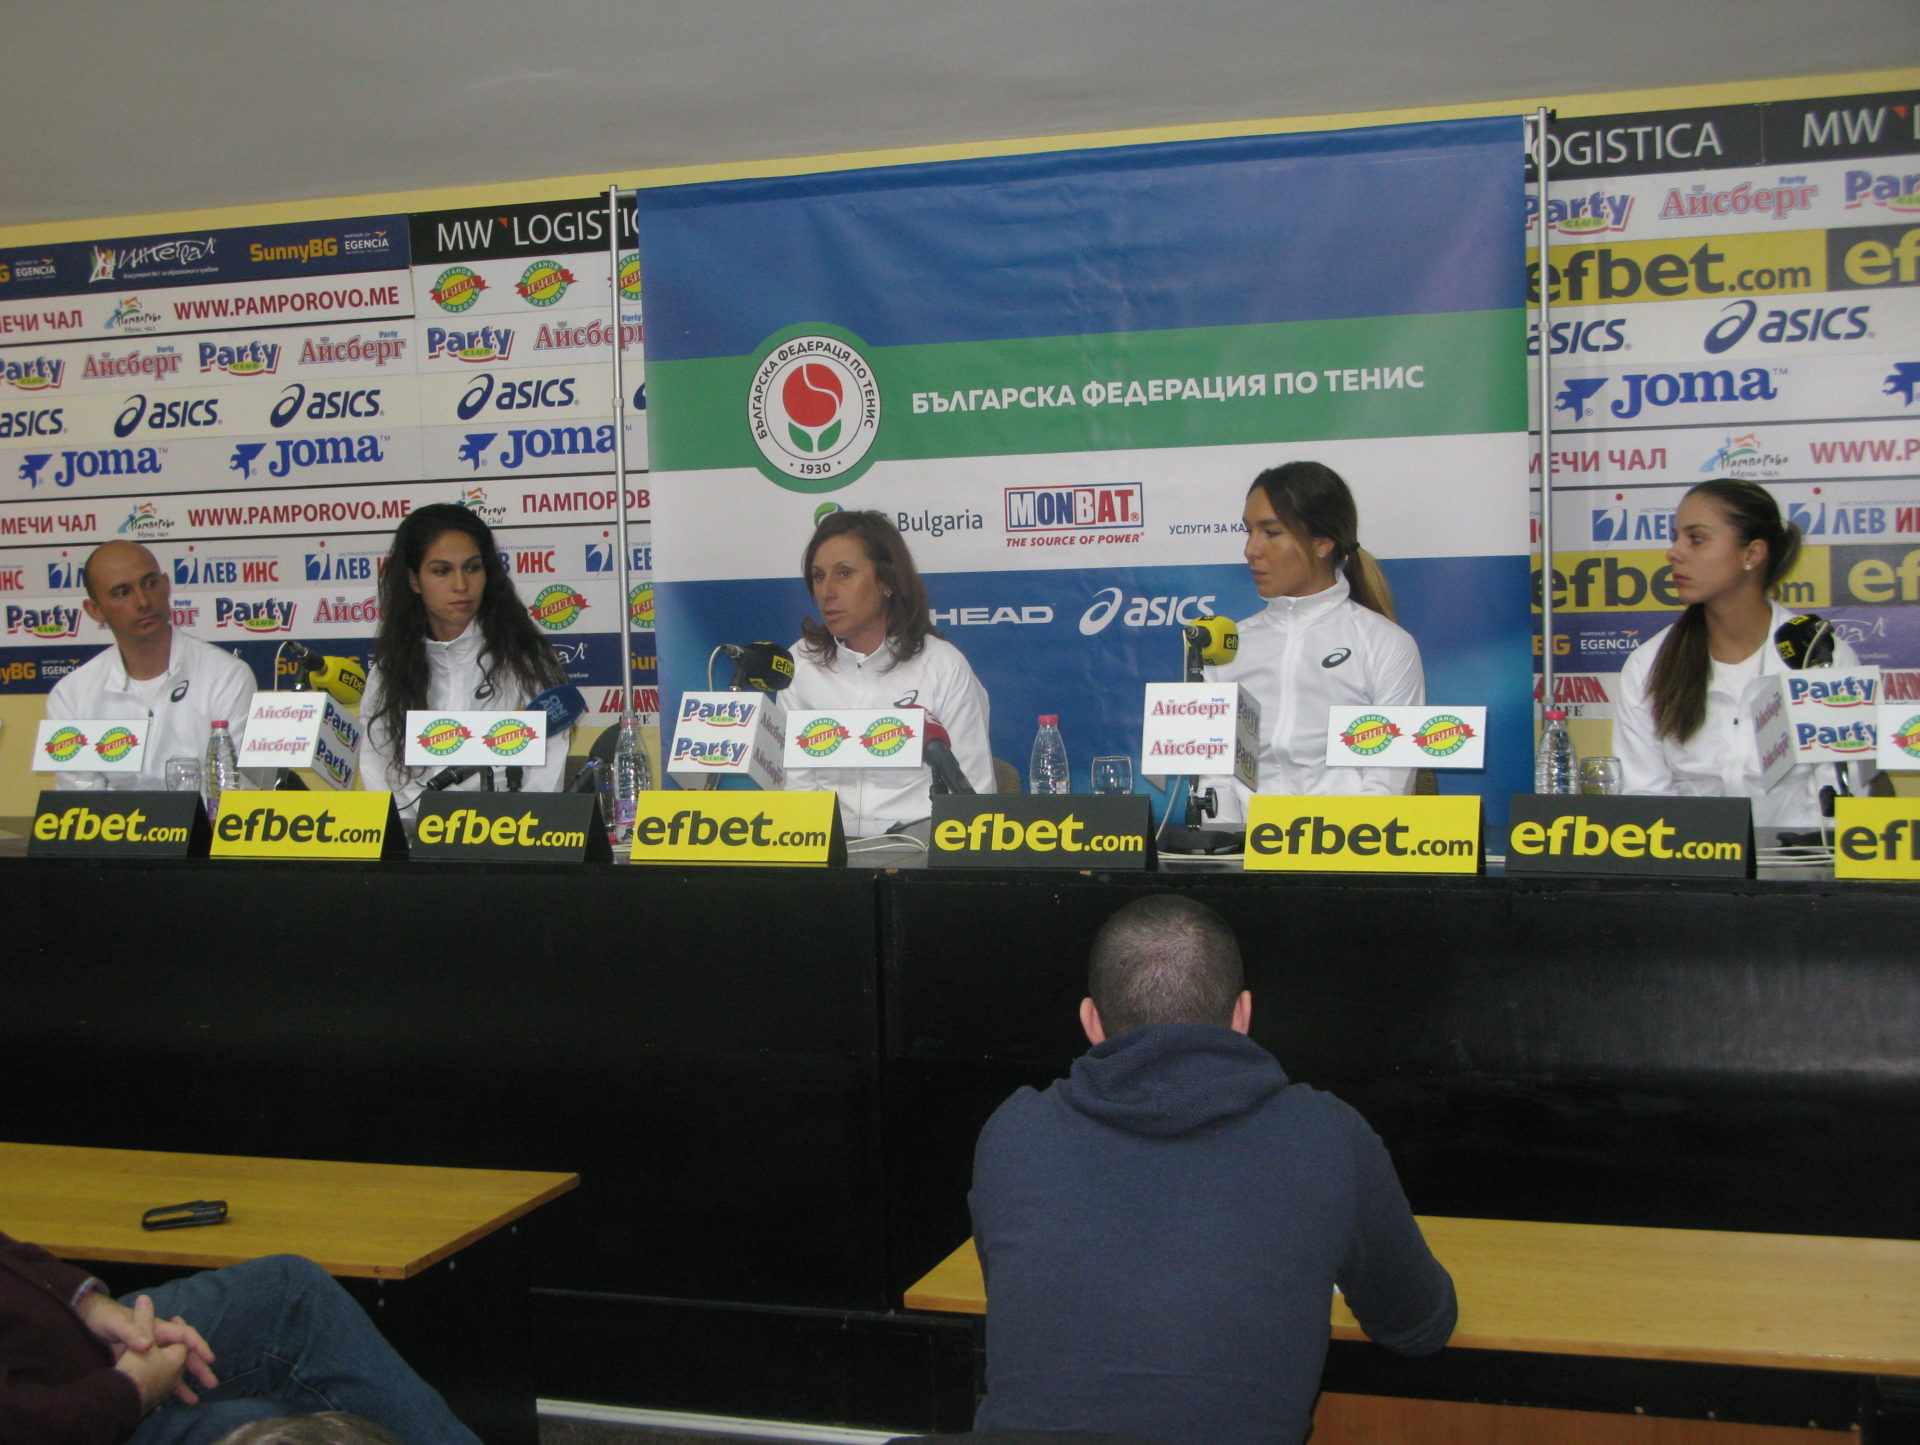 Дора Рангелова: Очаквам Цвети Пиронкова да подкрепи отбора на лагера в Пловдив